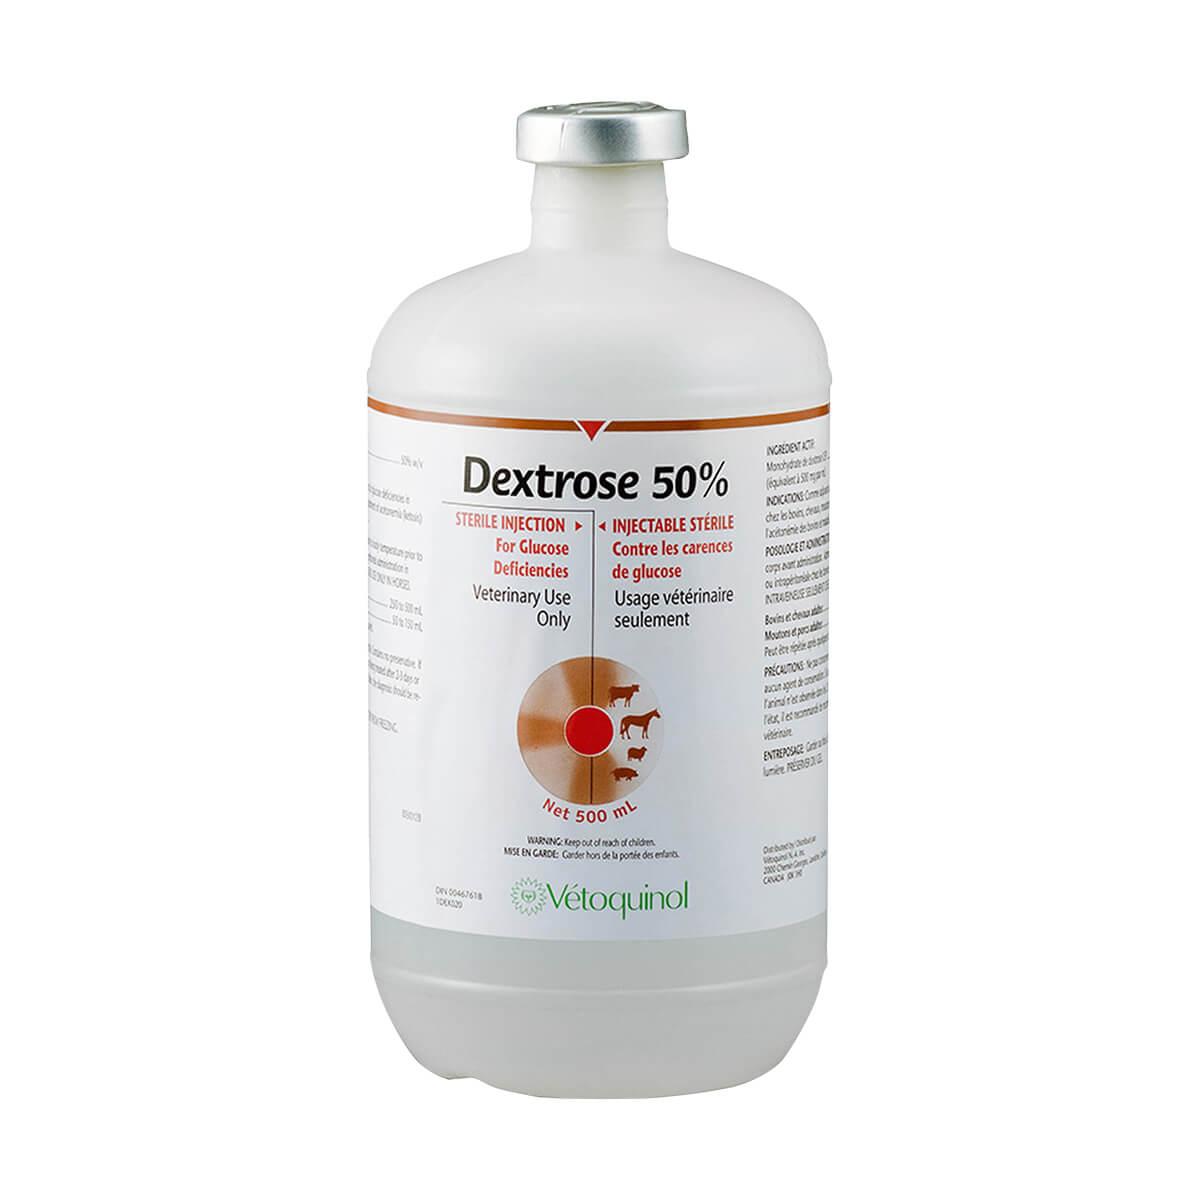 Dextrose 50%